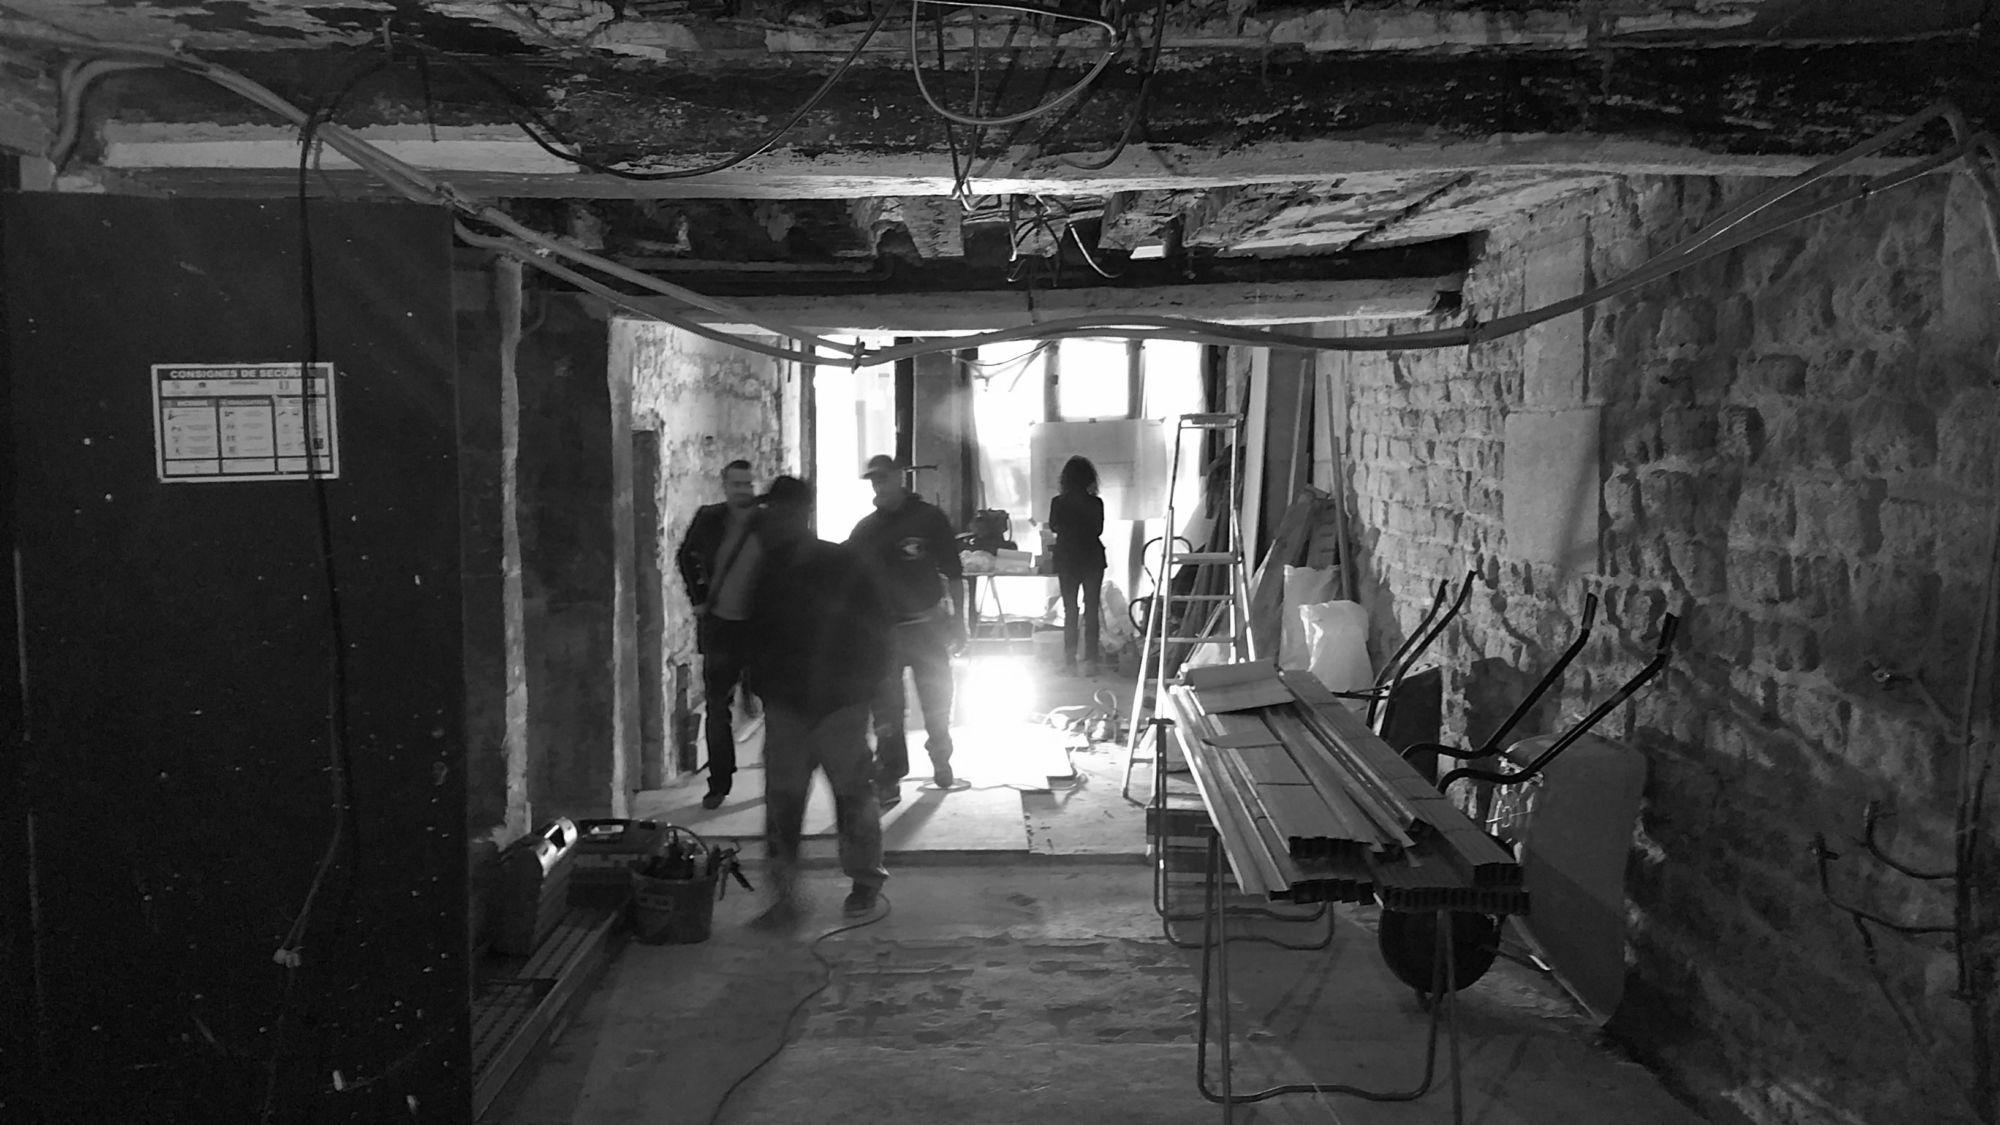 Chantier intérieur, salle de restauration